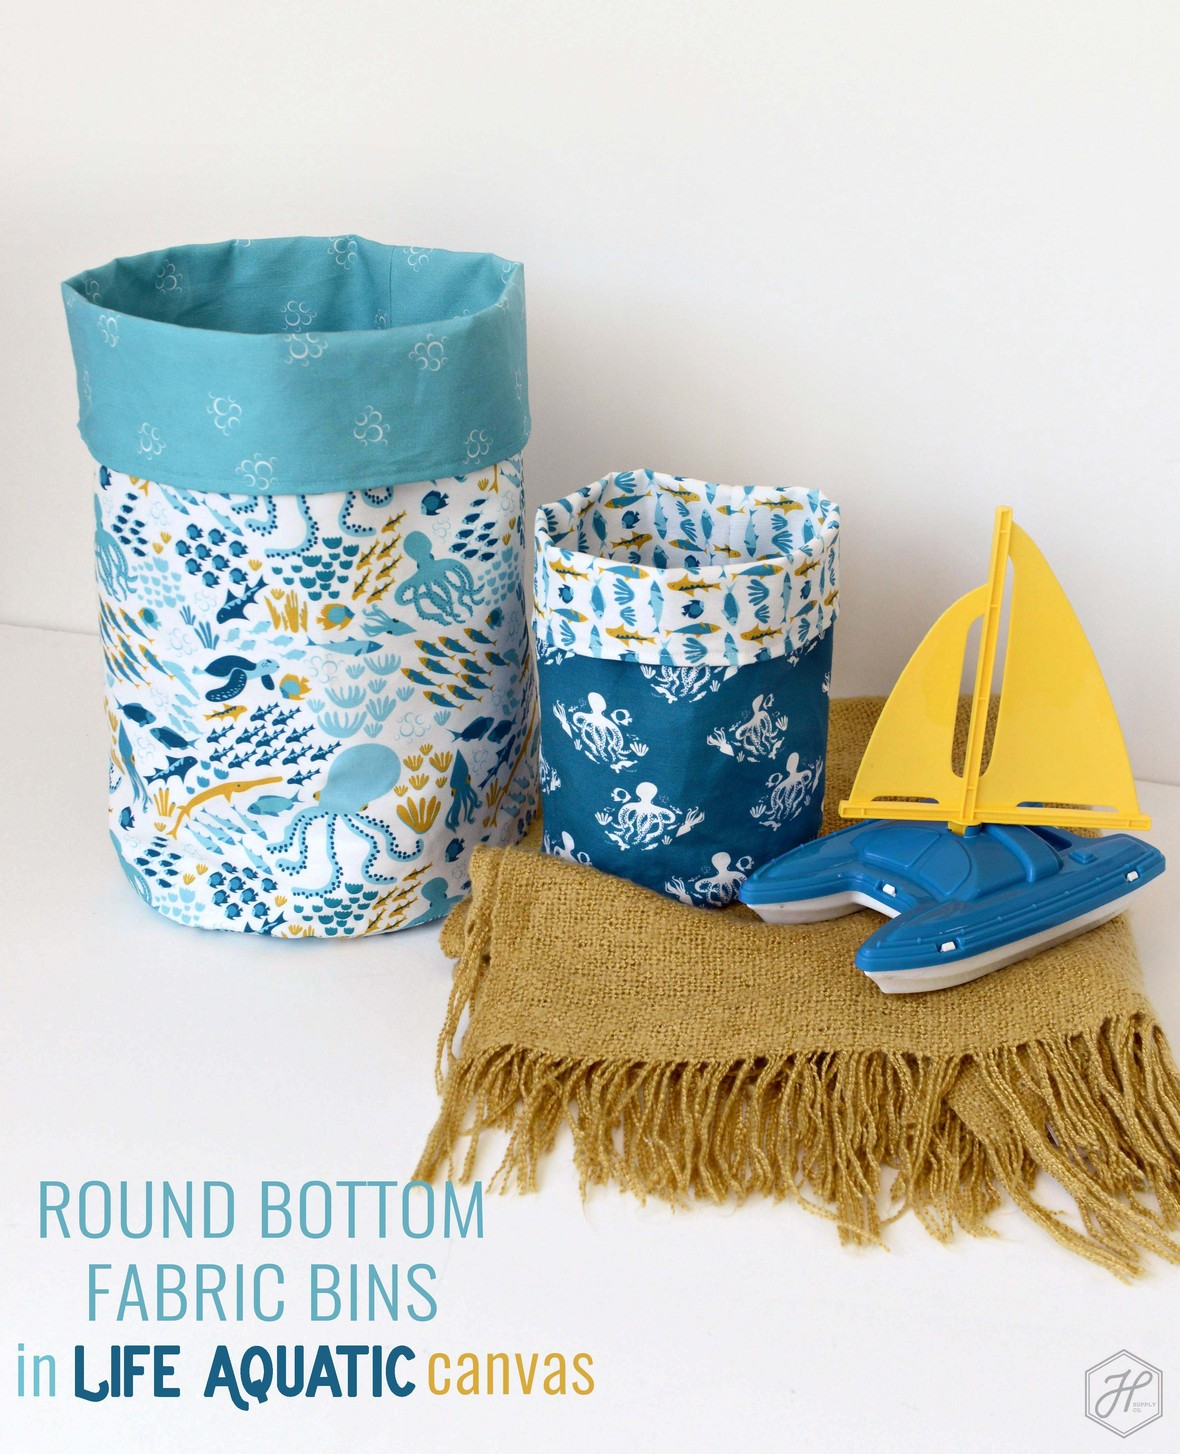 Life Aquatic Linen Cotton Canvas Round Bottom Bins Hawthorne Supply Co